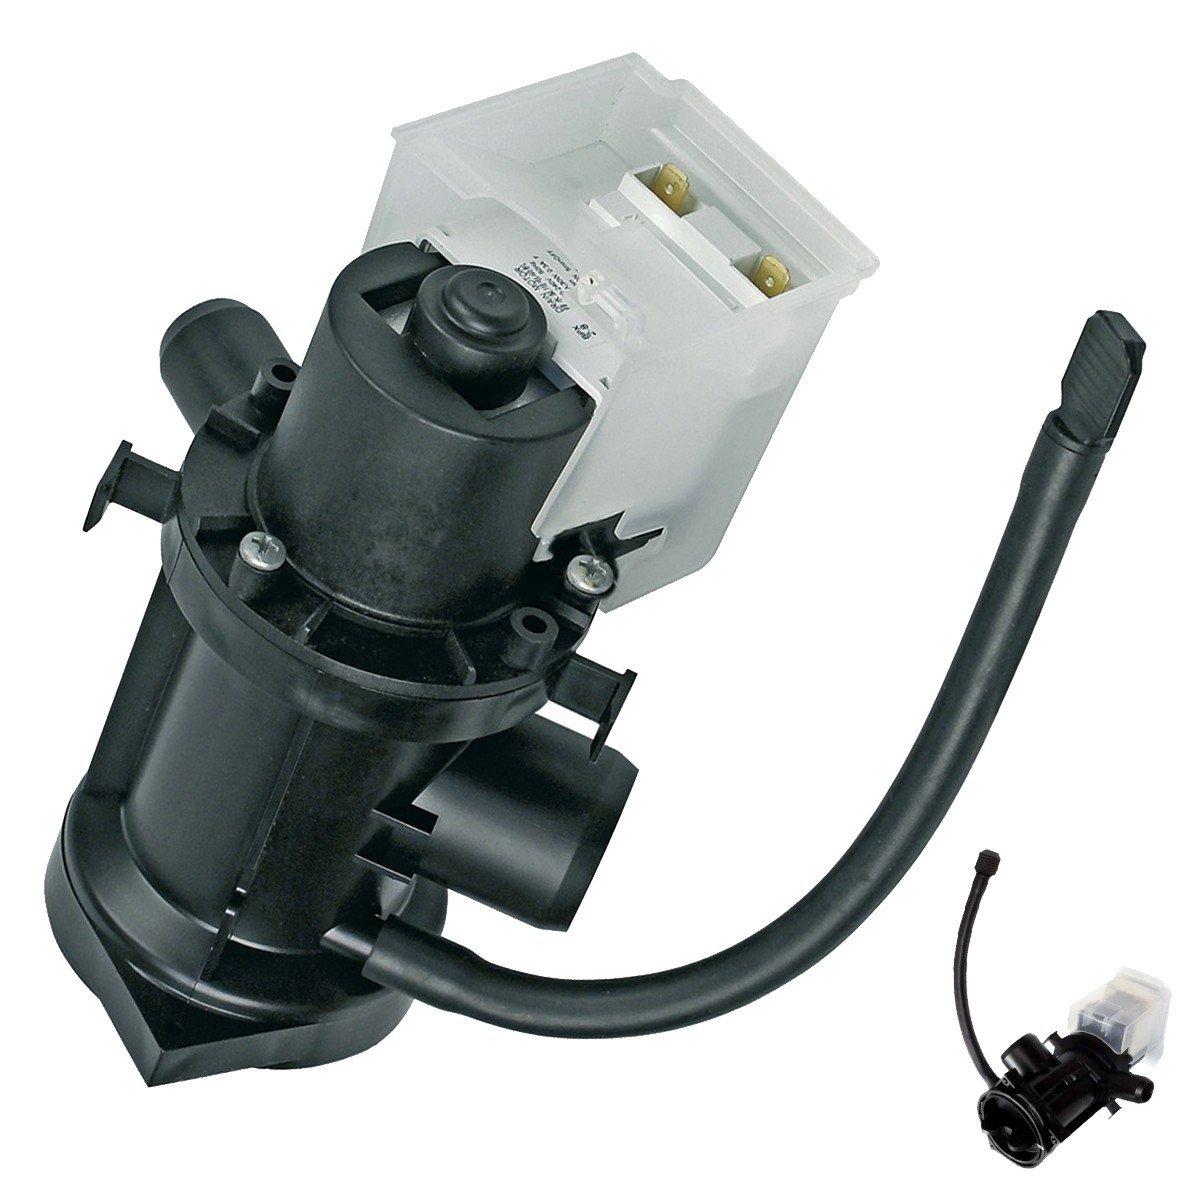 Bomba de desagüe de con motor - Lavadoras - LG - ref60119: Amazon ...